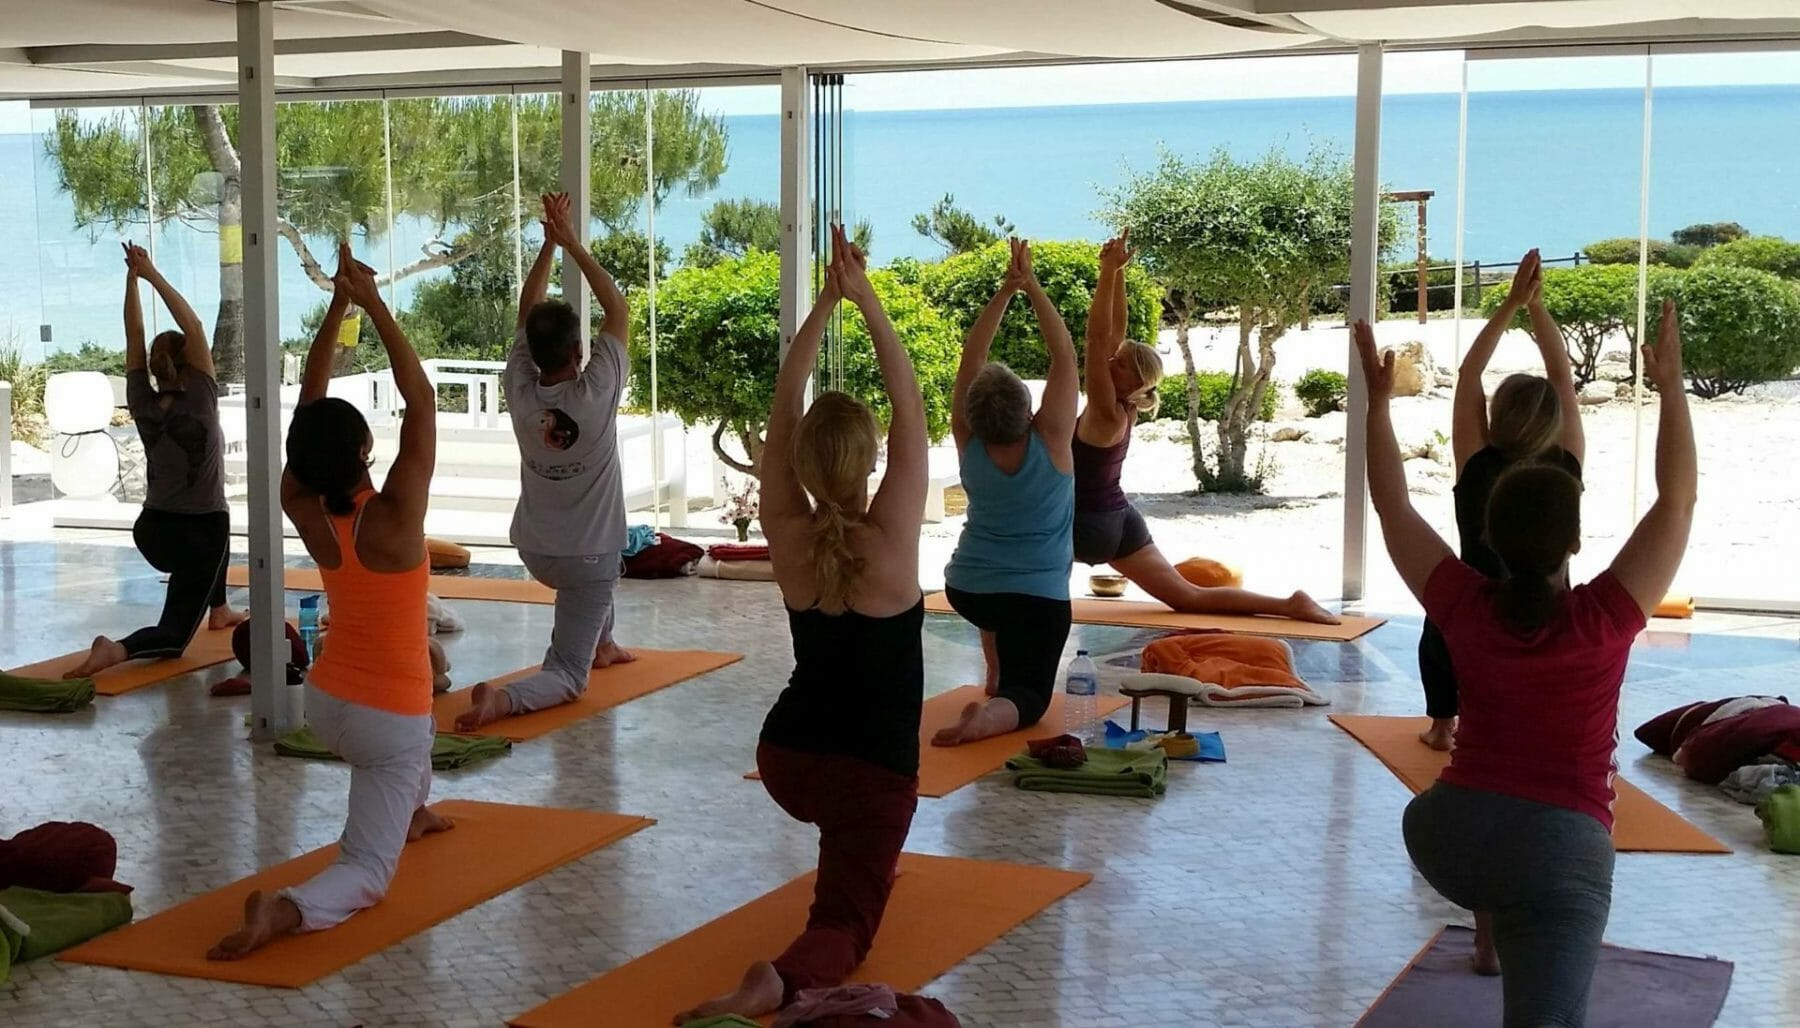 Yogagruppe am Meer auf Klippe über dem Atlantik